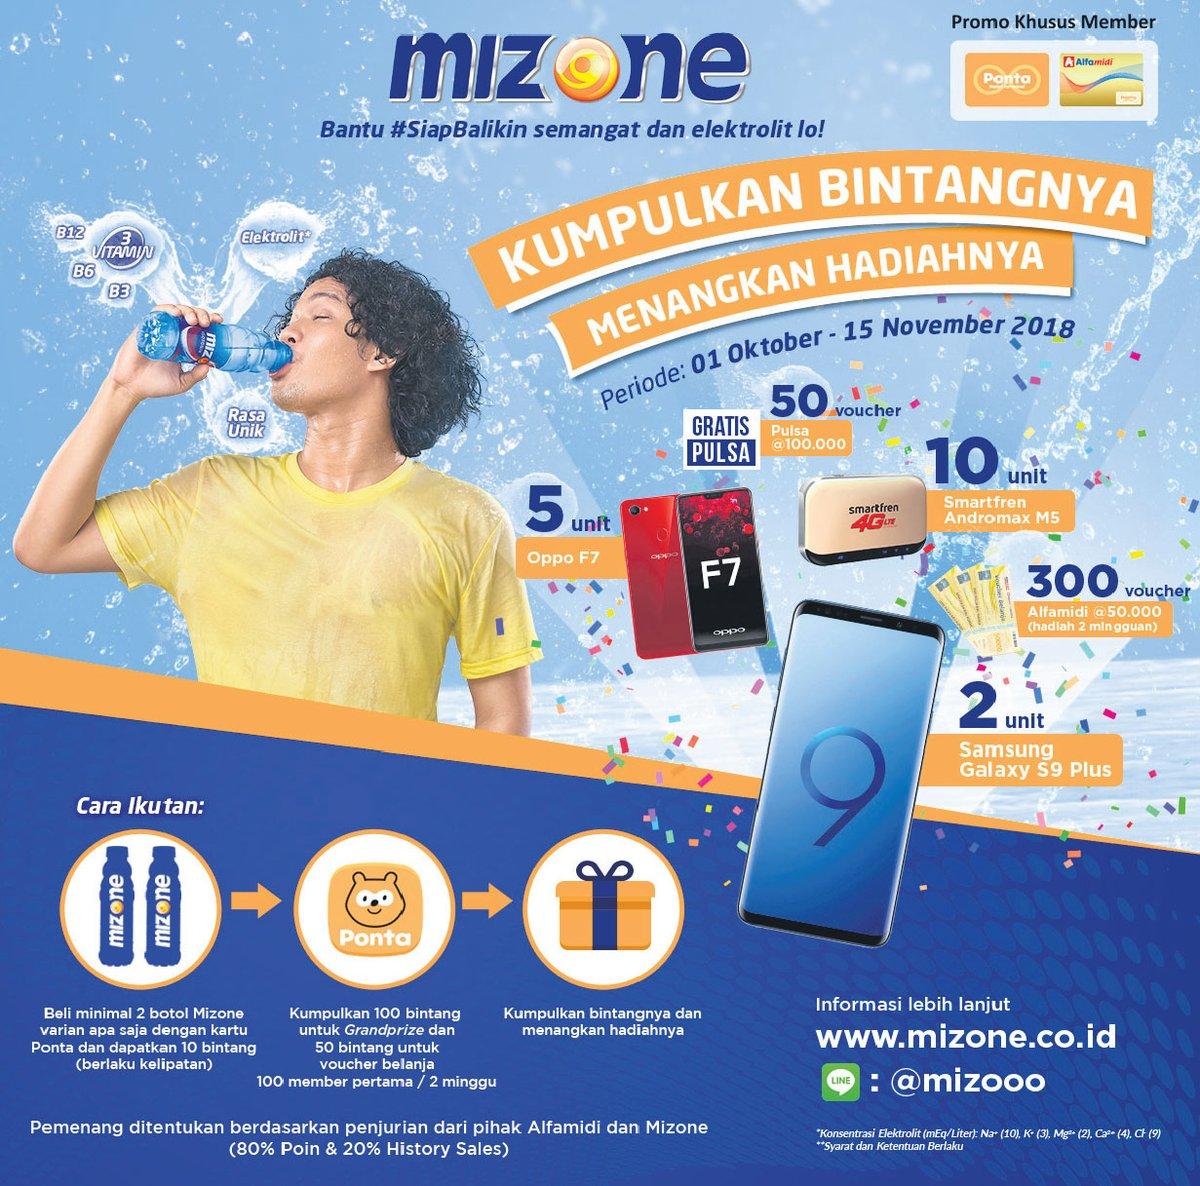 Alfamidi - Promo Mizone & Dapatkan Hadiahnya Pakai Kartu Ponta (s.d 15 Nov 2018)